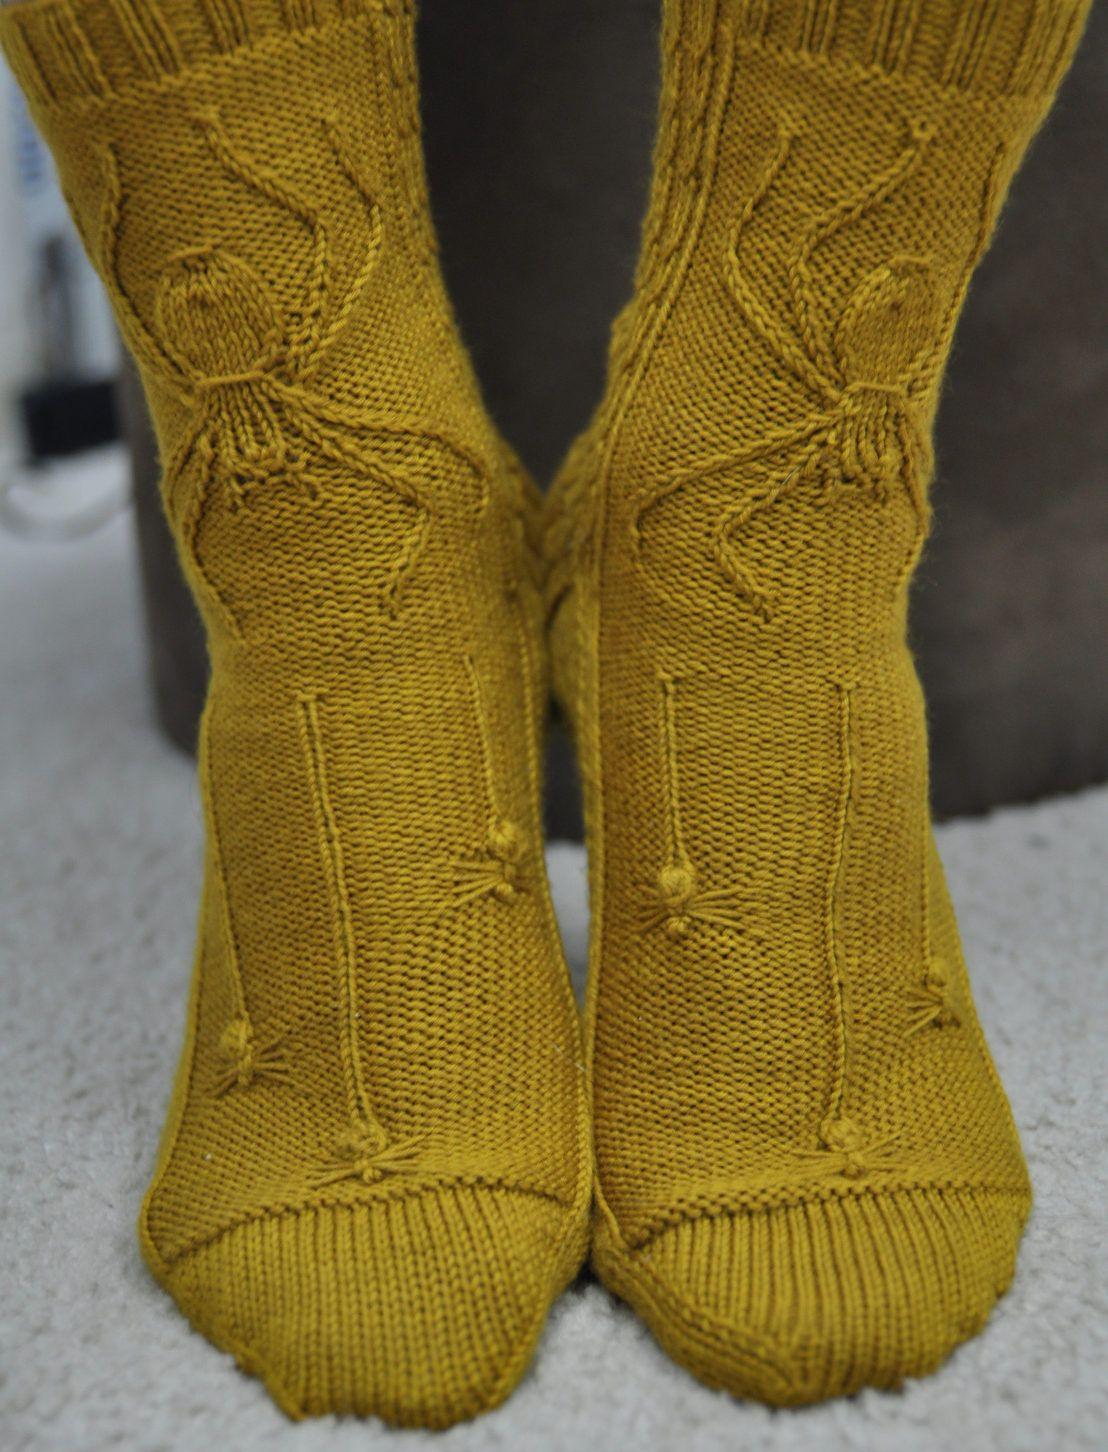 Free Knitting Pattern For Spider Socks Terri Knight Adapted